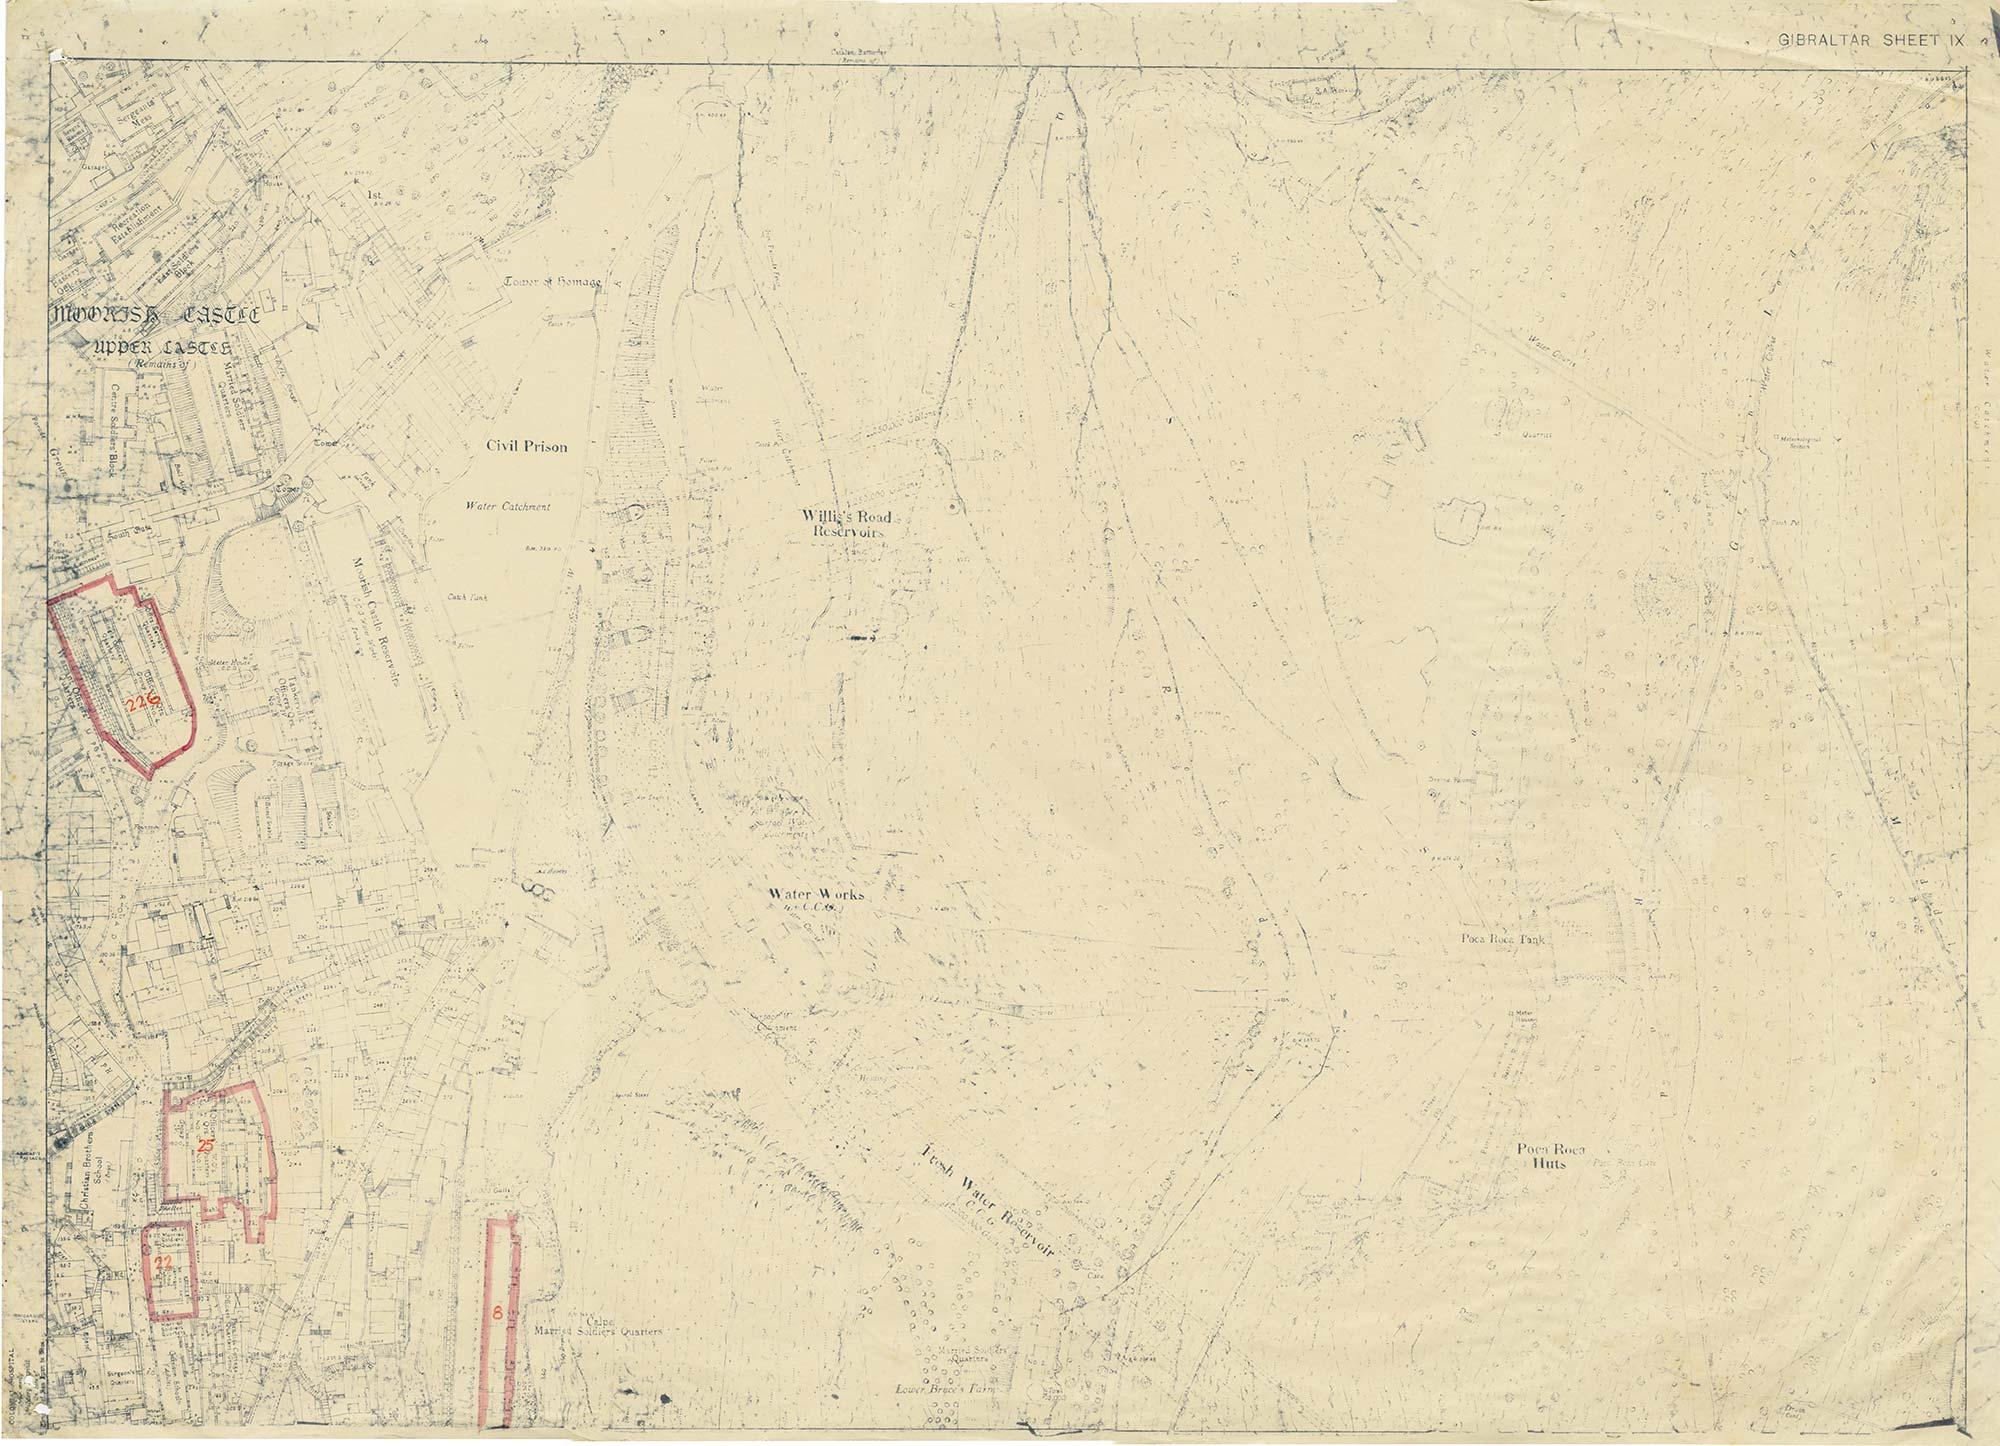 Map-12-OS-Sheet-09-Moorish-Castle